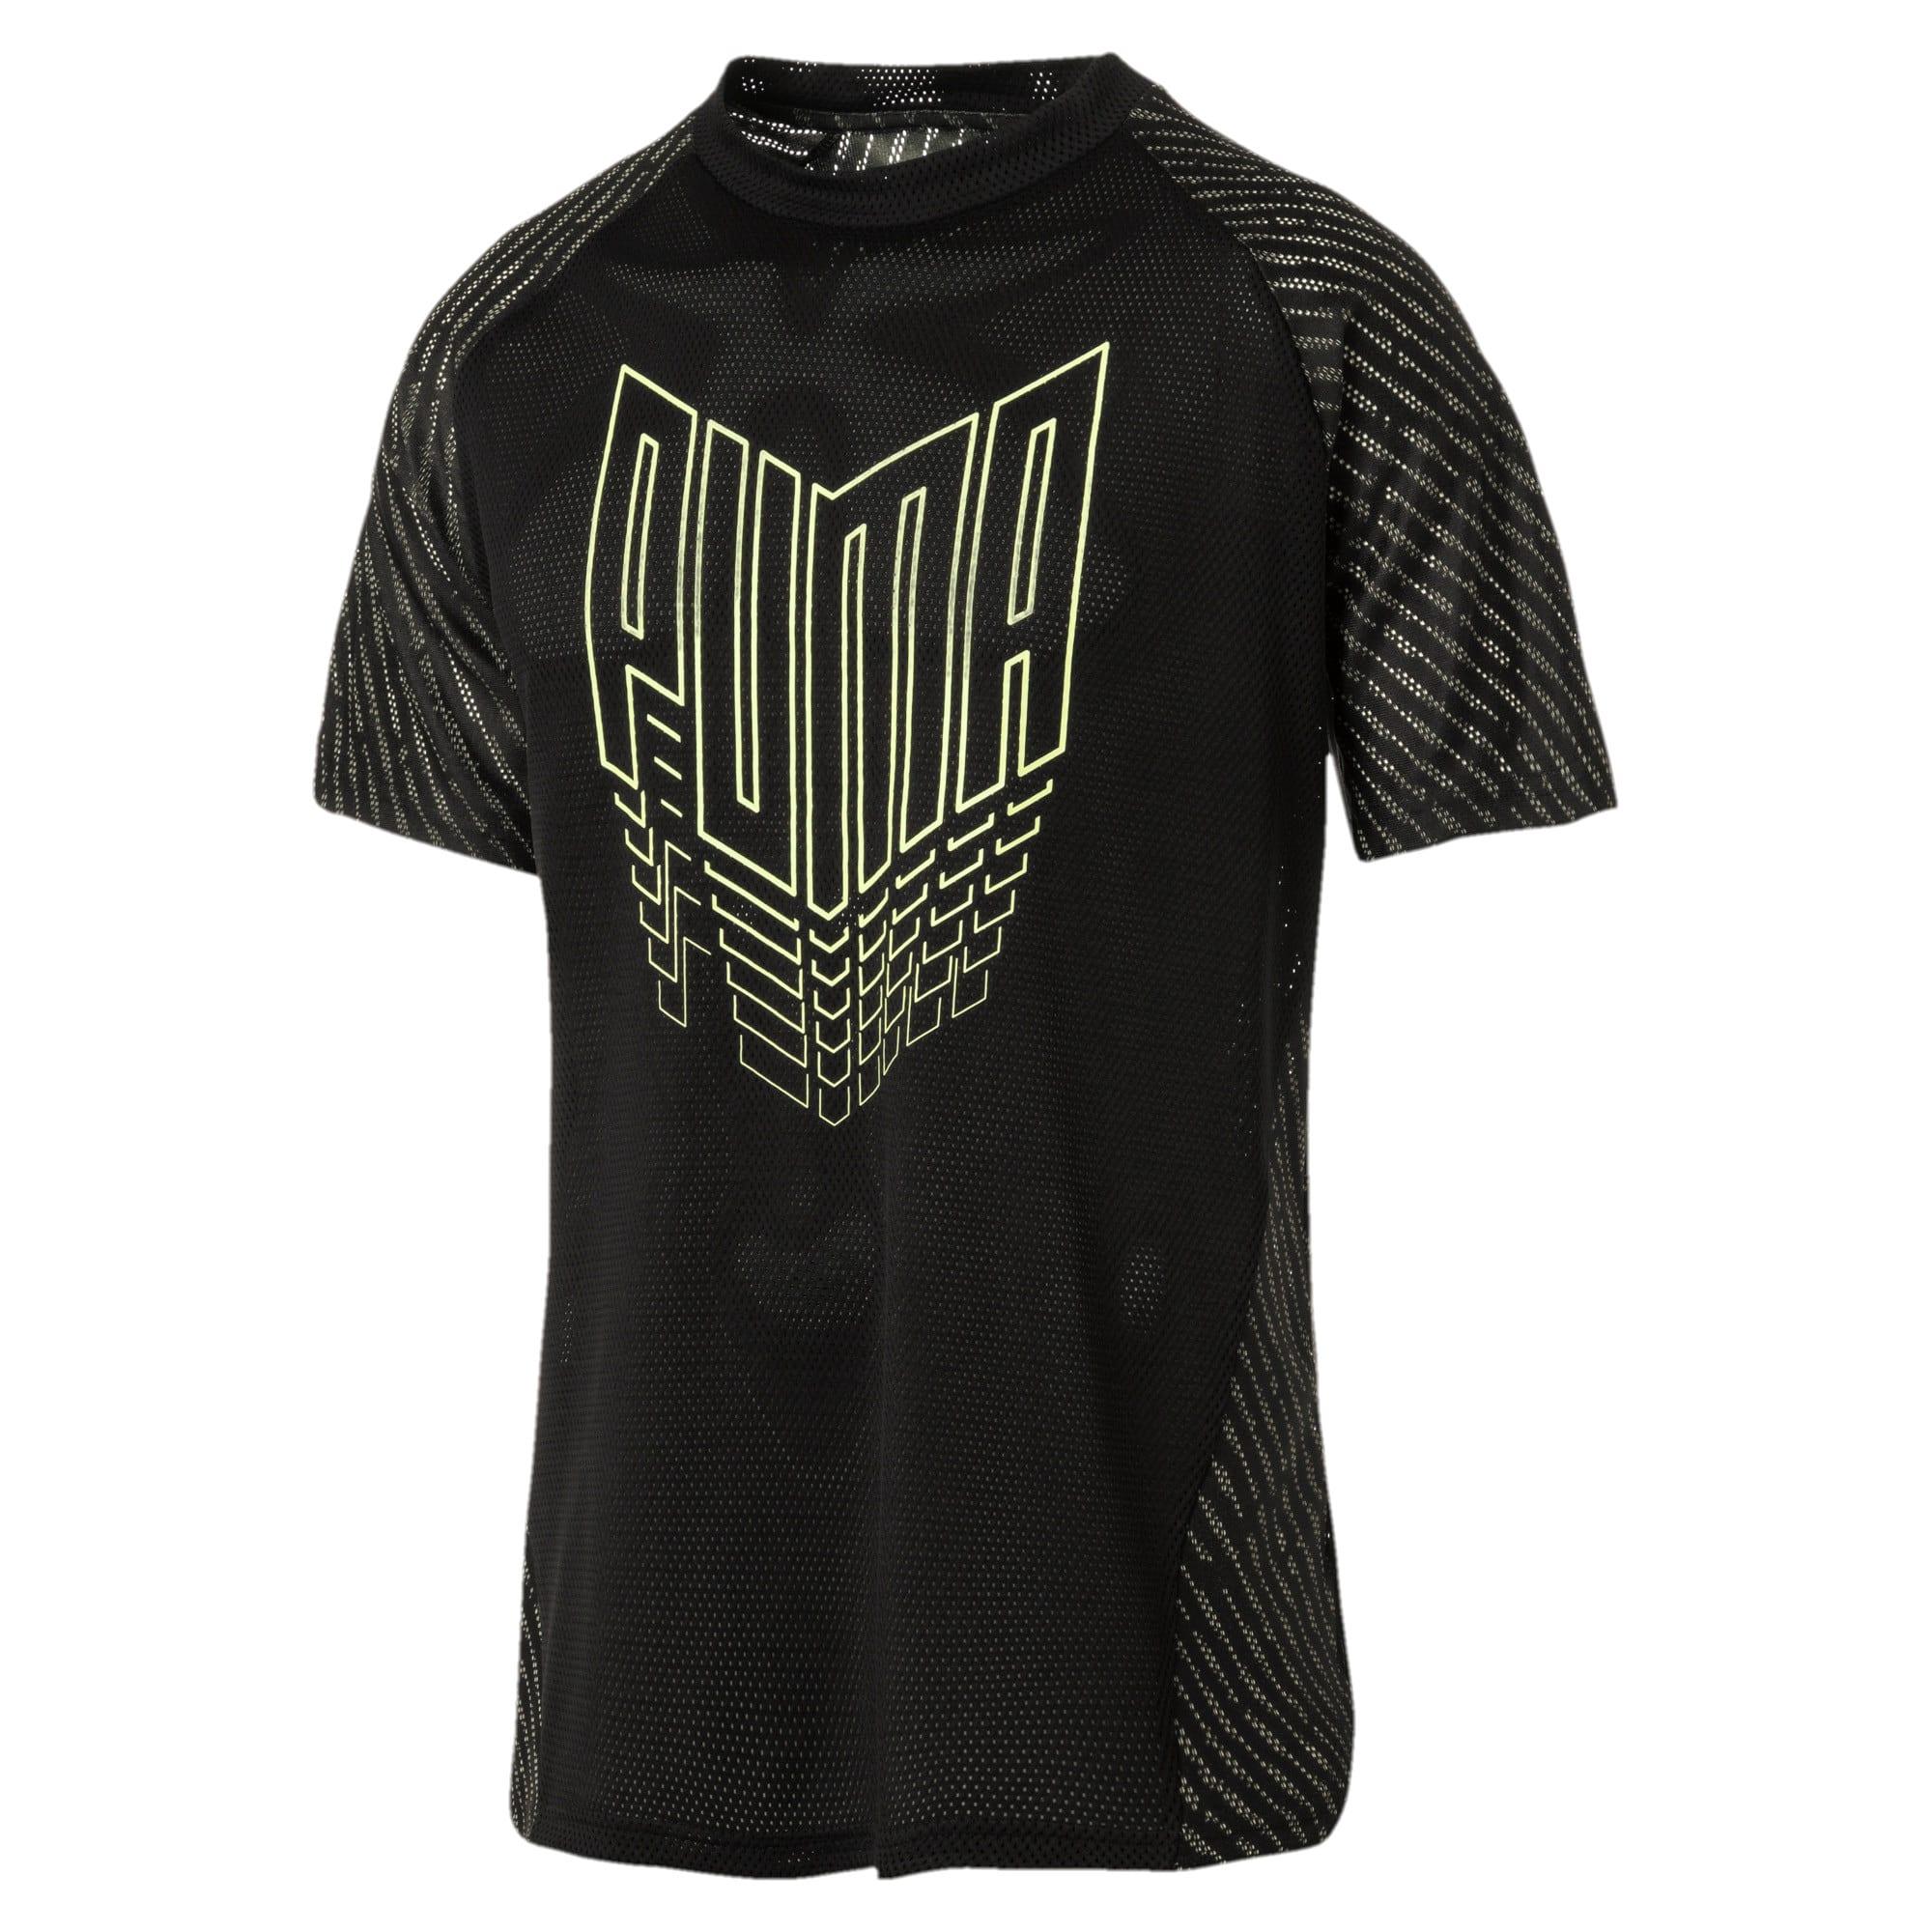 Thumbnail 4 of VENT Herren Trainingsshirt, Puma Black, medium